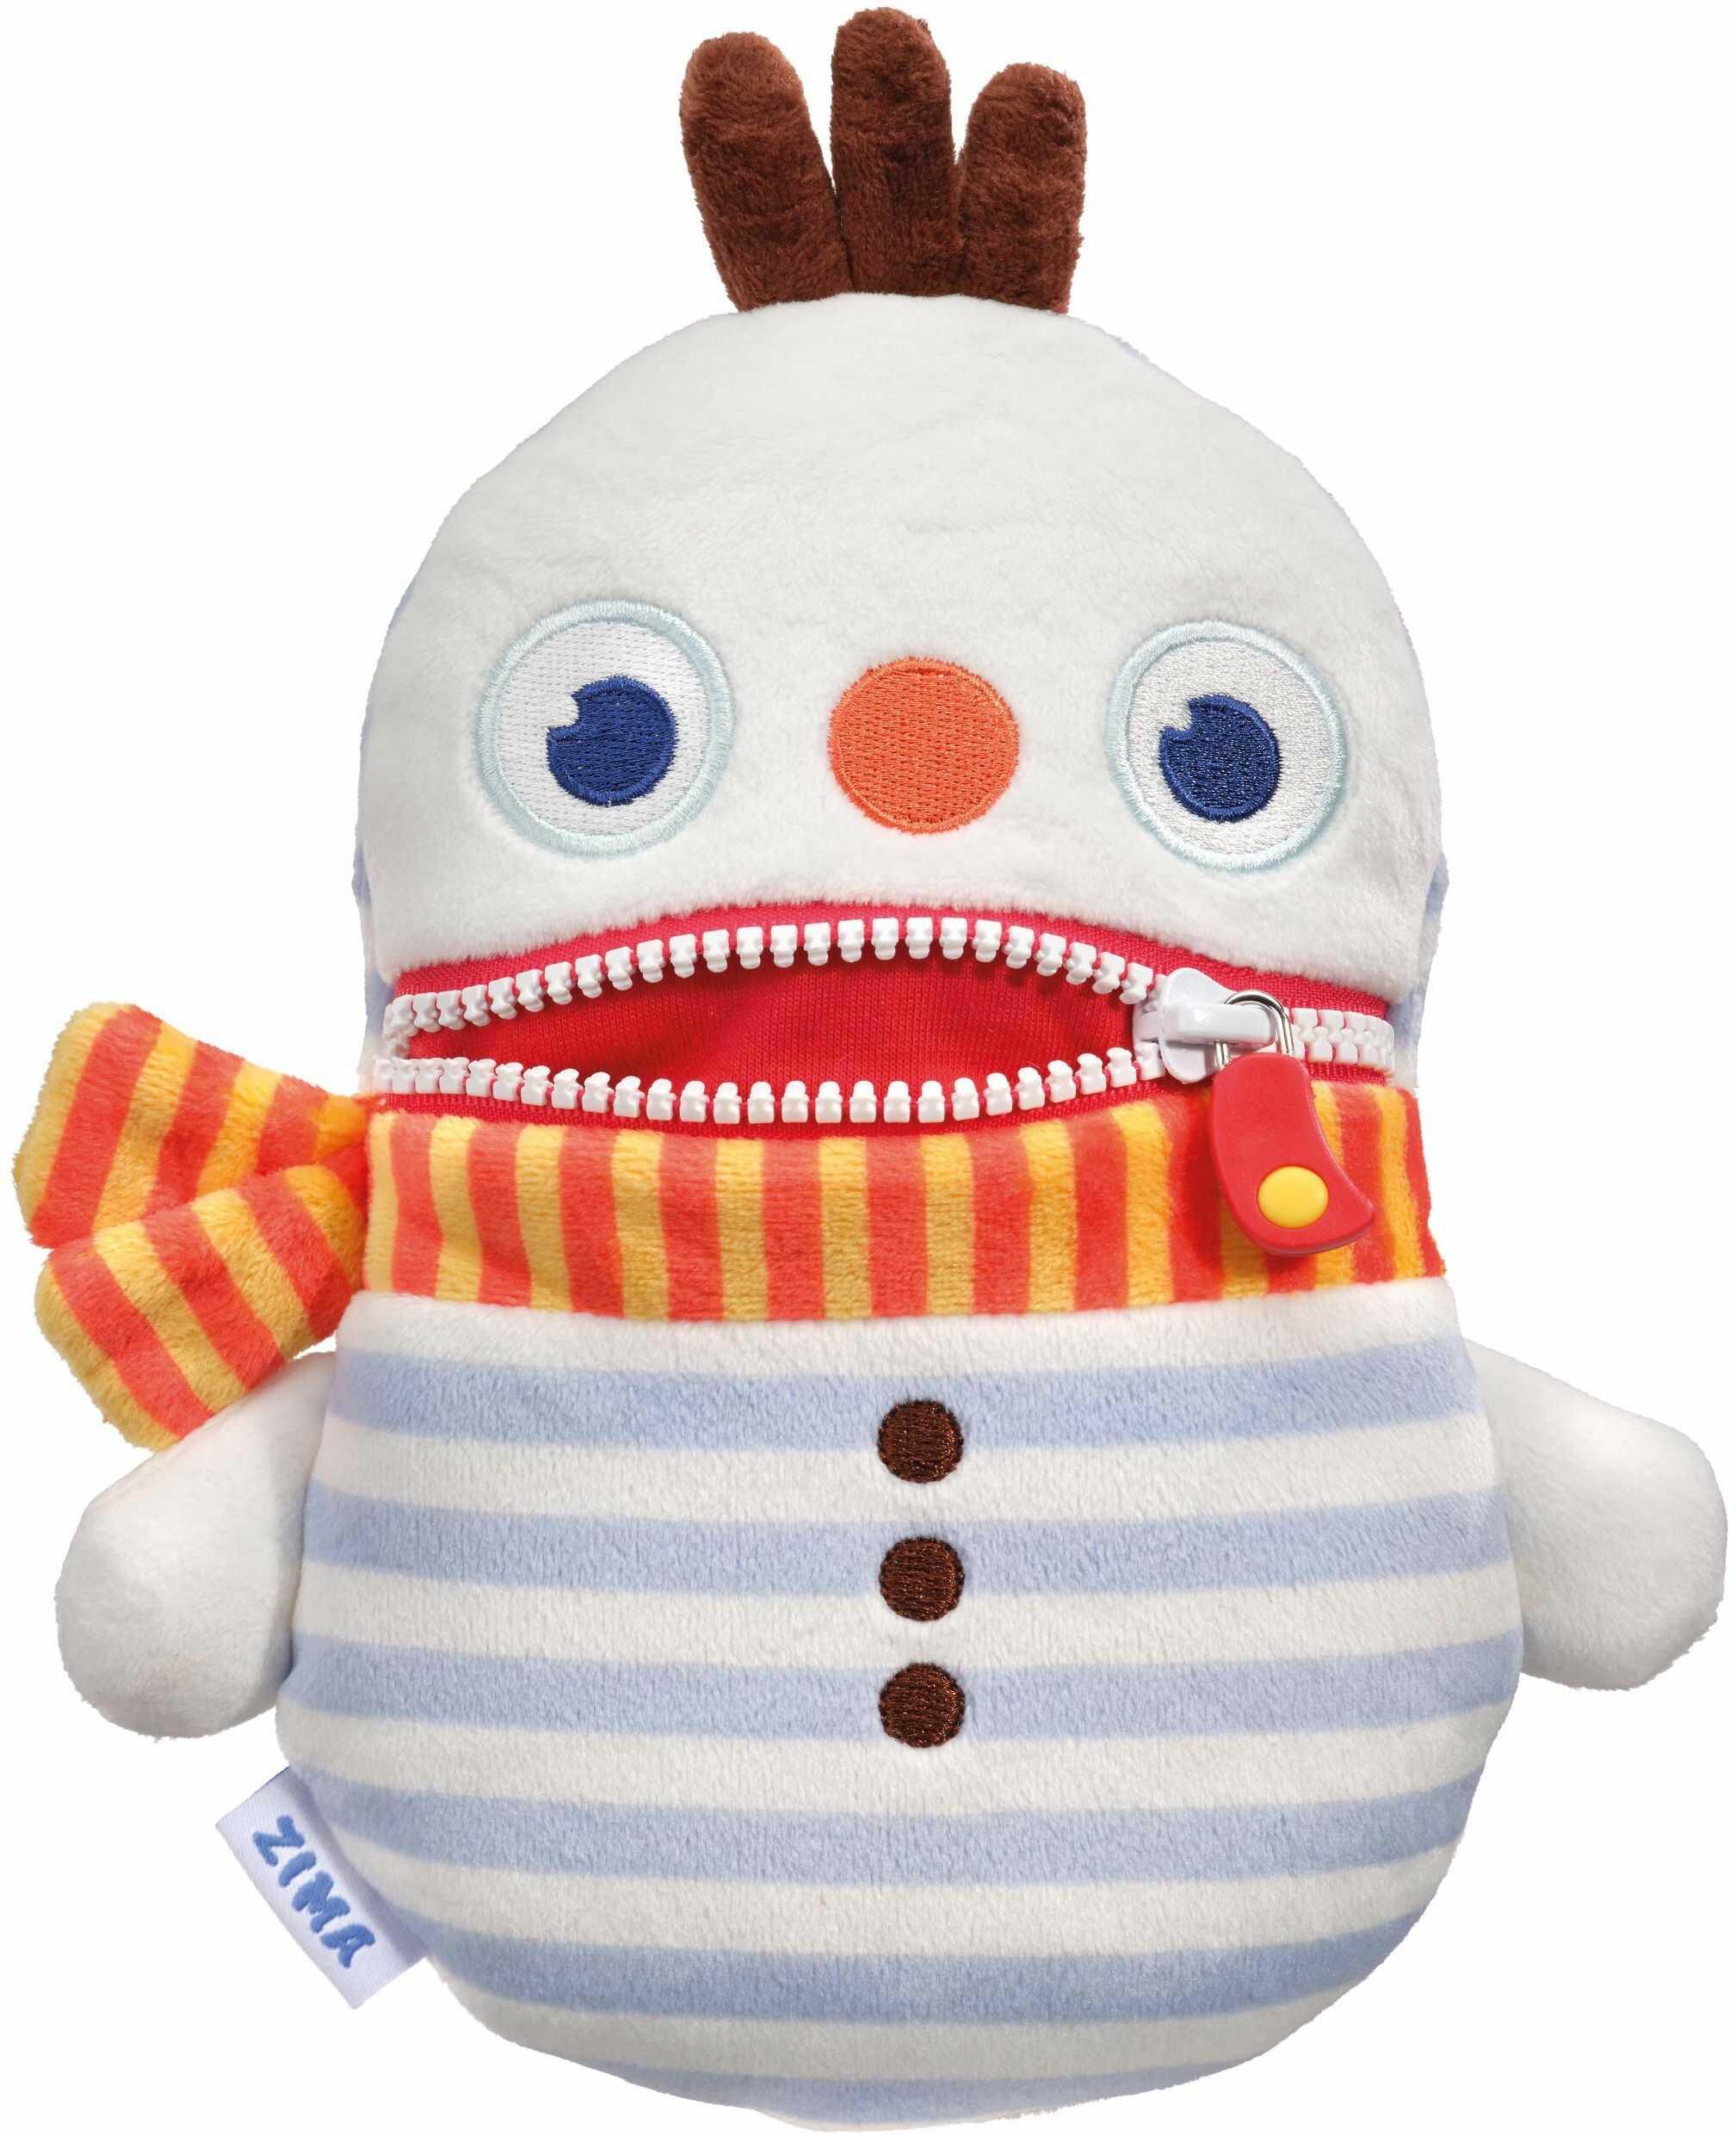 Zima, klein, 21,5 cm, Jingle Dolls Edition: Plüsch Sorgenfresser klein, Edition Jingle Dolls